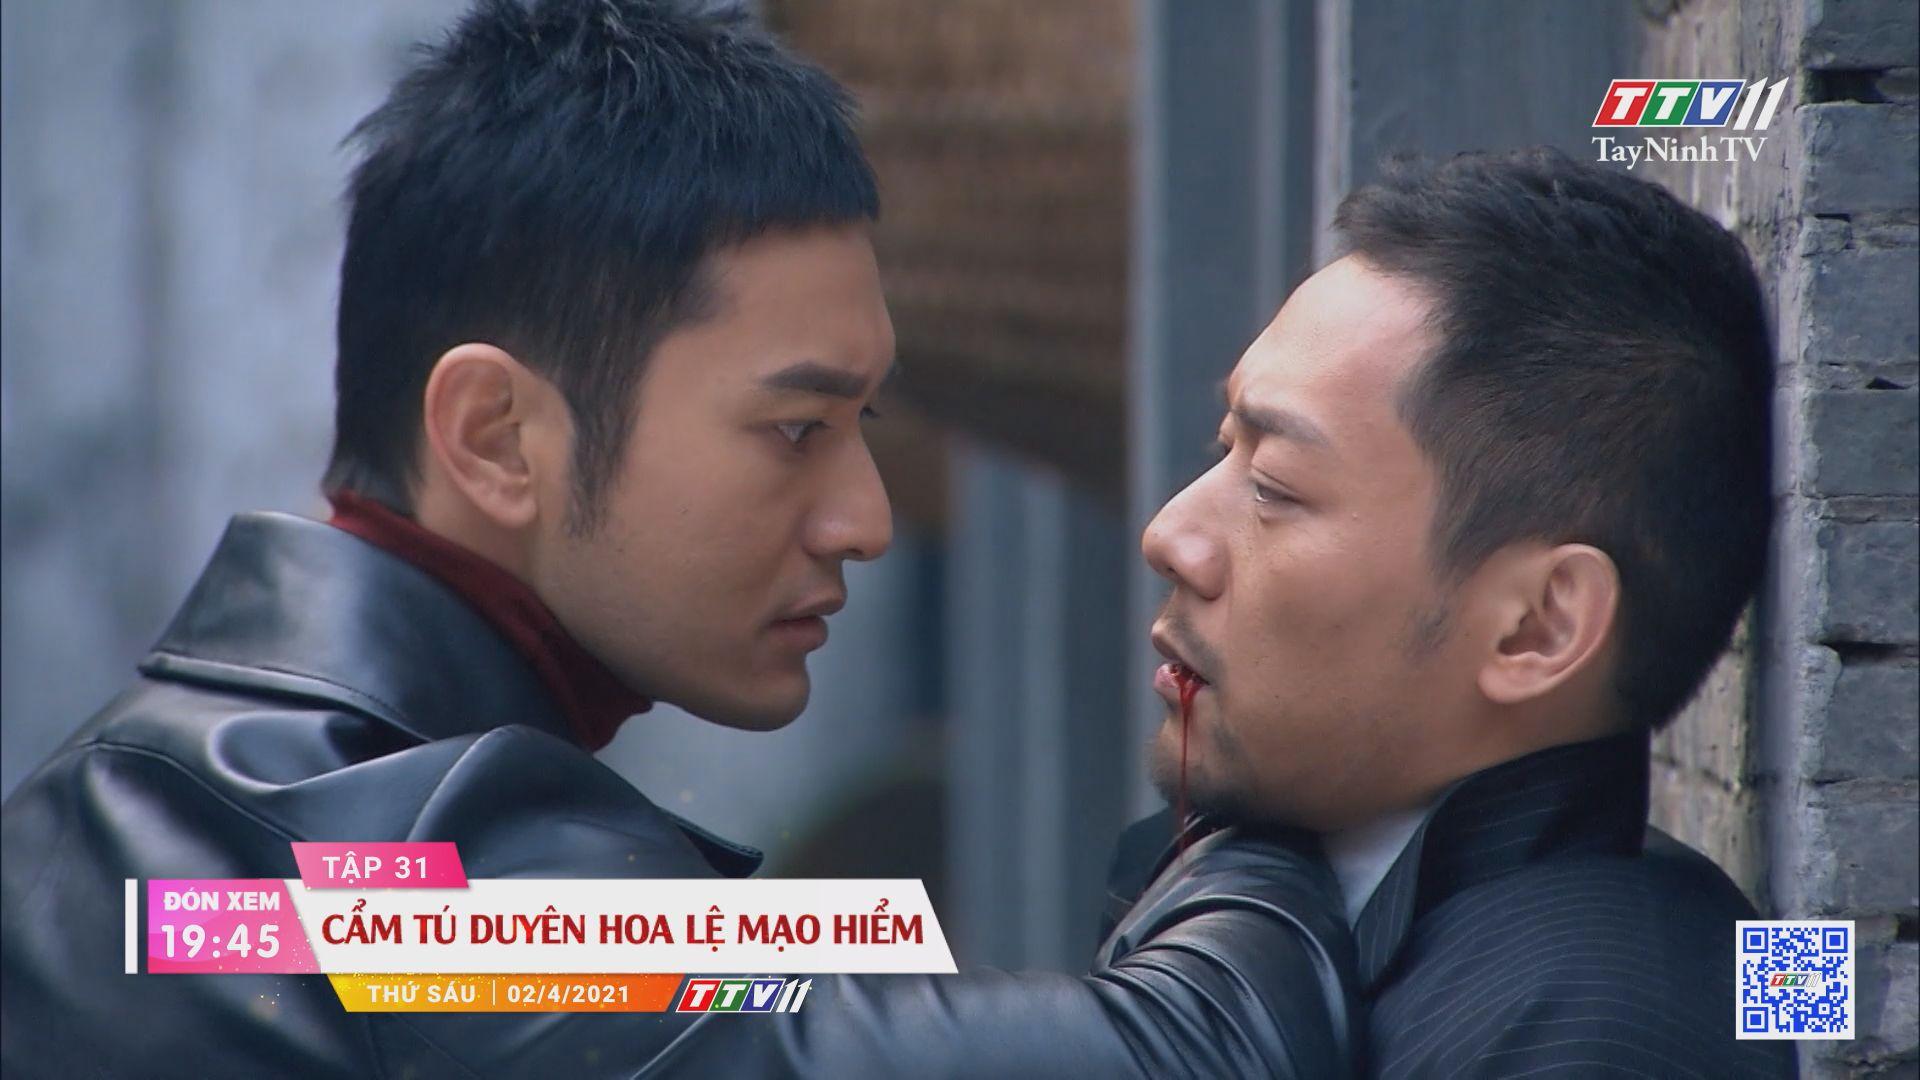 Cẩm Tú duyên hoa lệ mạo hiểm-Trailer tập 31 | PHIM CẨM TÚ DUYÊN HOA LỆ MẠO HIỂM | TayNinhTVE